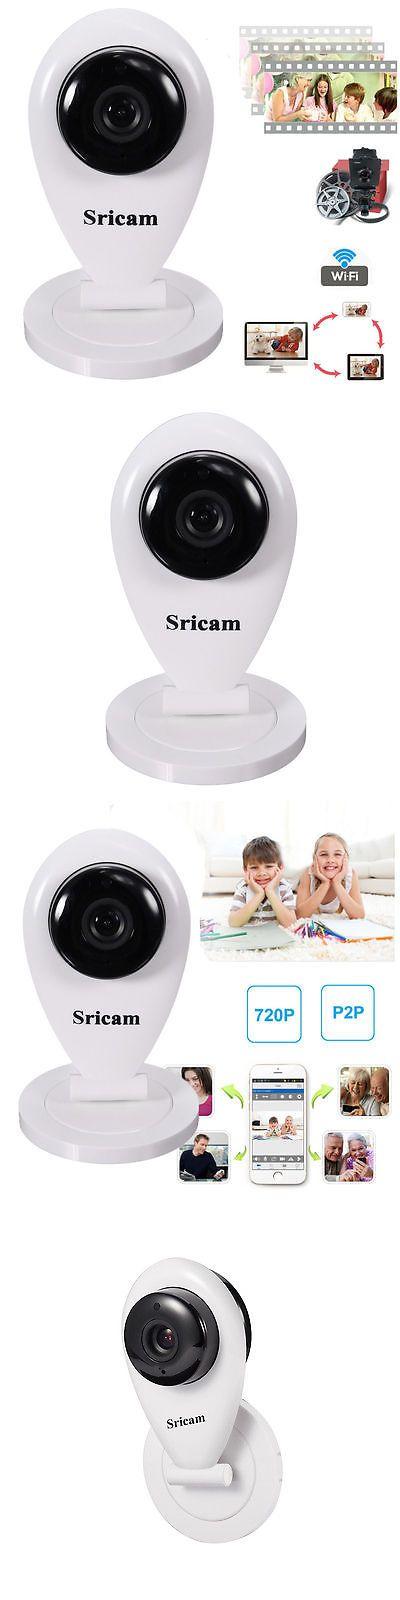 Security Cameras: Wifi Hd 720P Indoor Waterproof Wireless Ir Home Cctv Security Network Ip Camera BUY IT NOW ONLY: $30.99